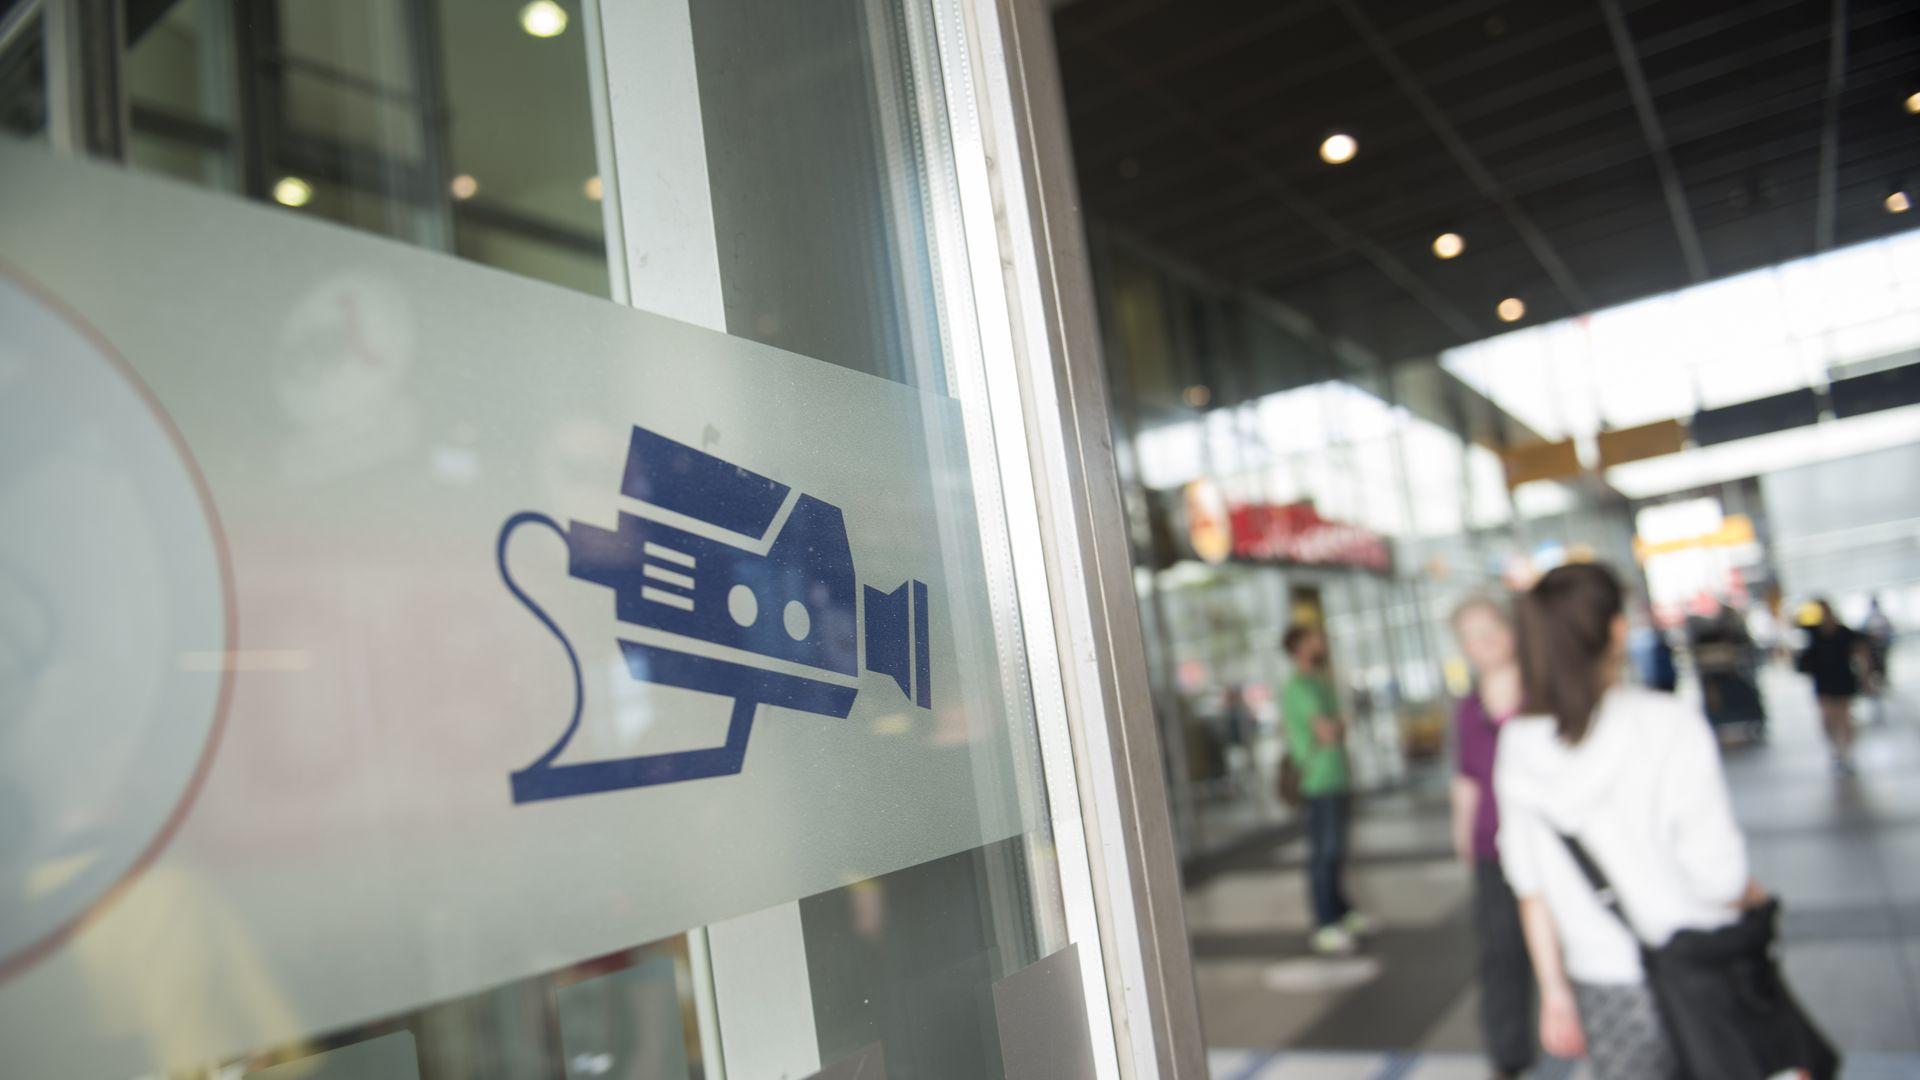 A sign revealing a camera